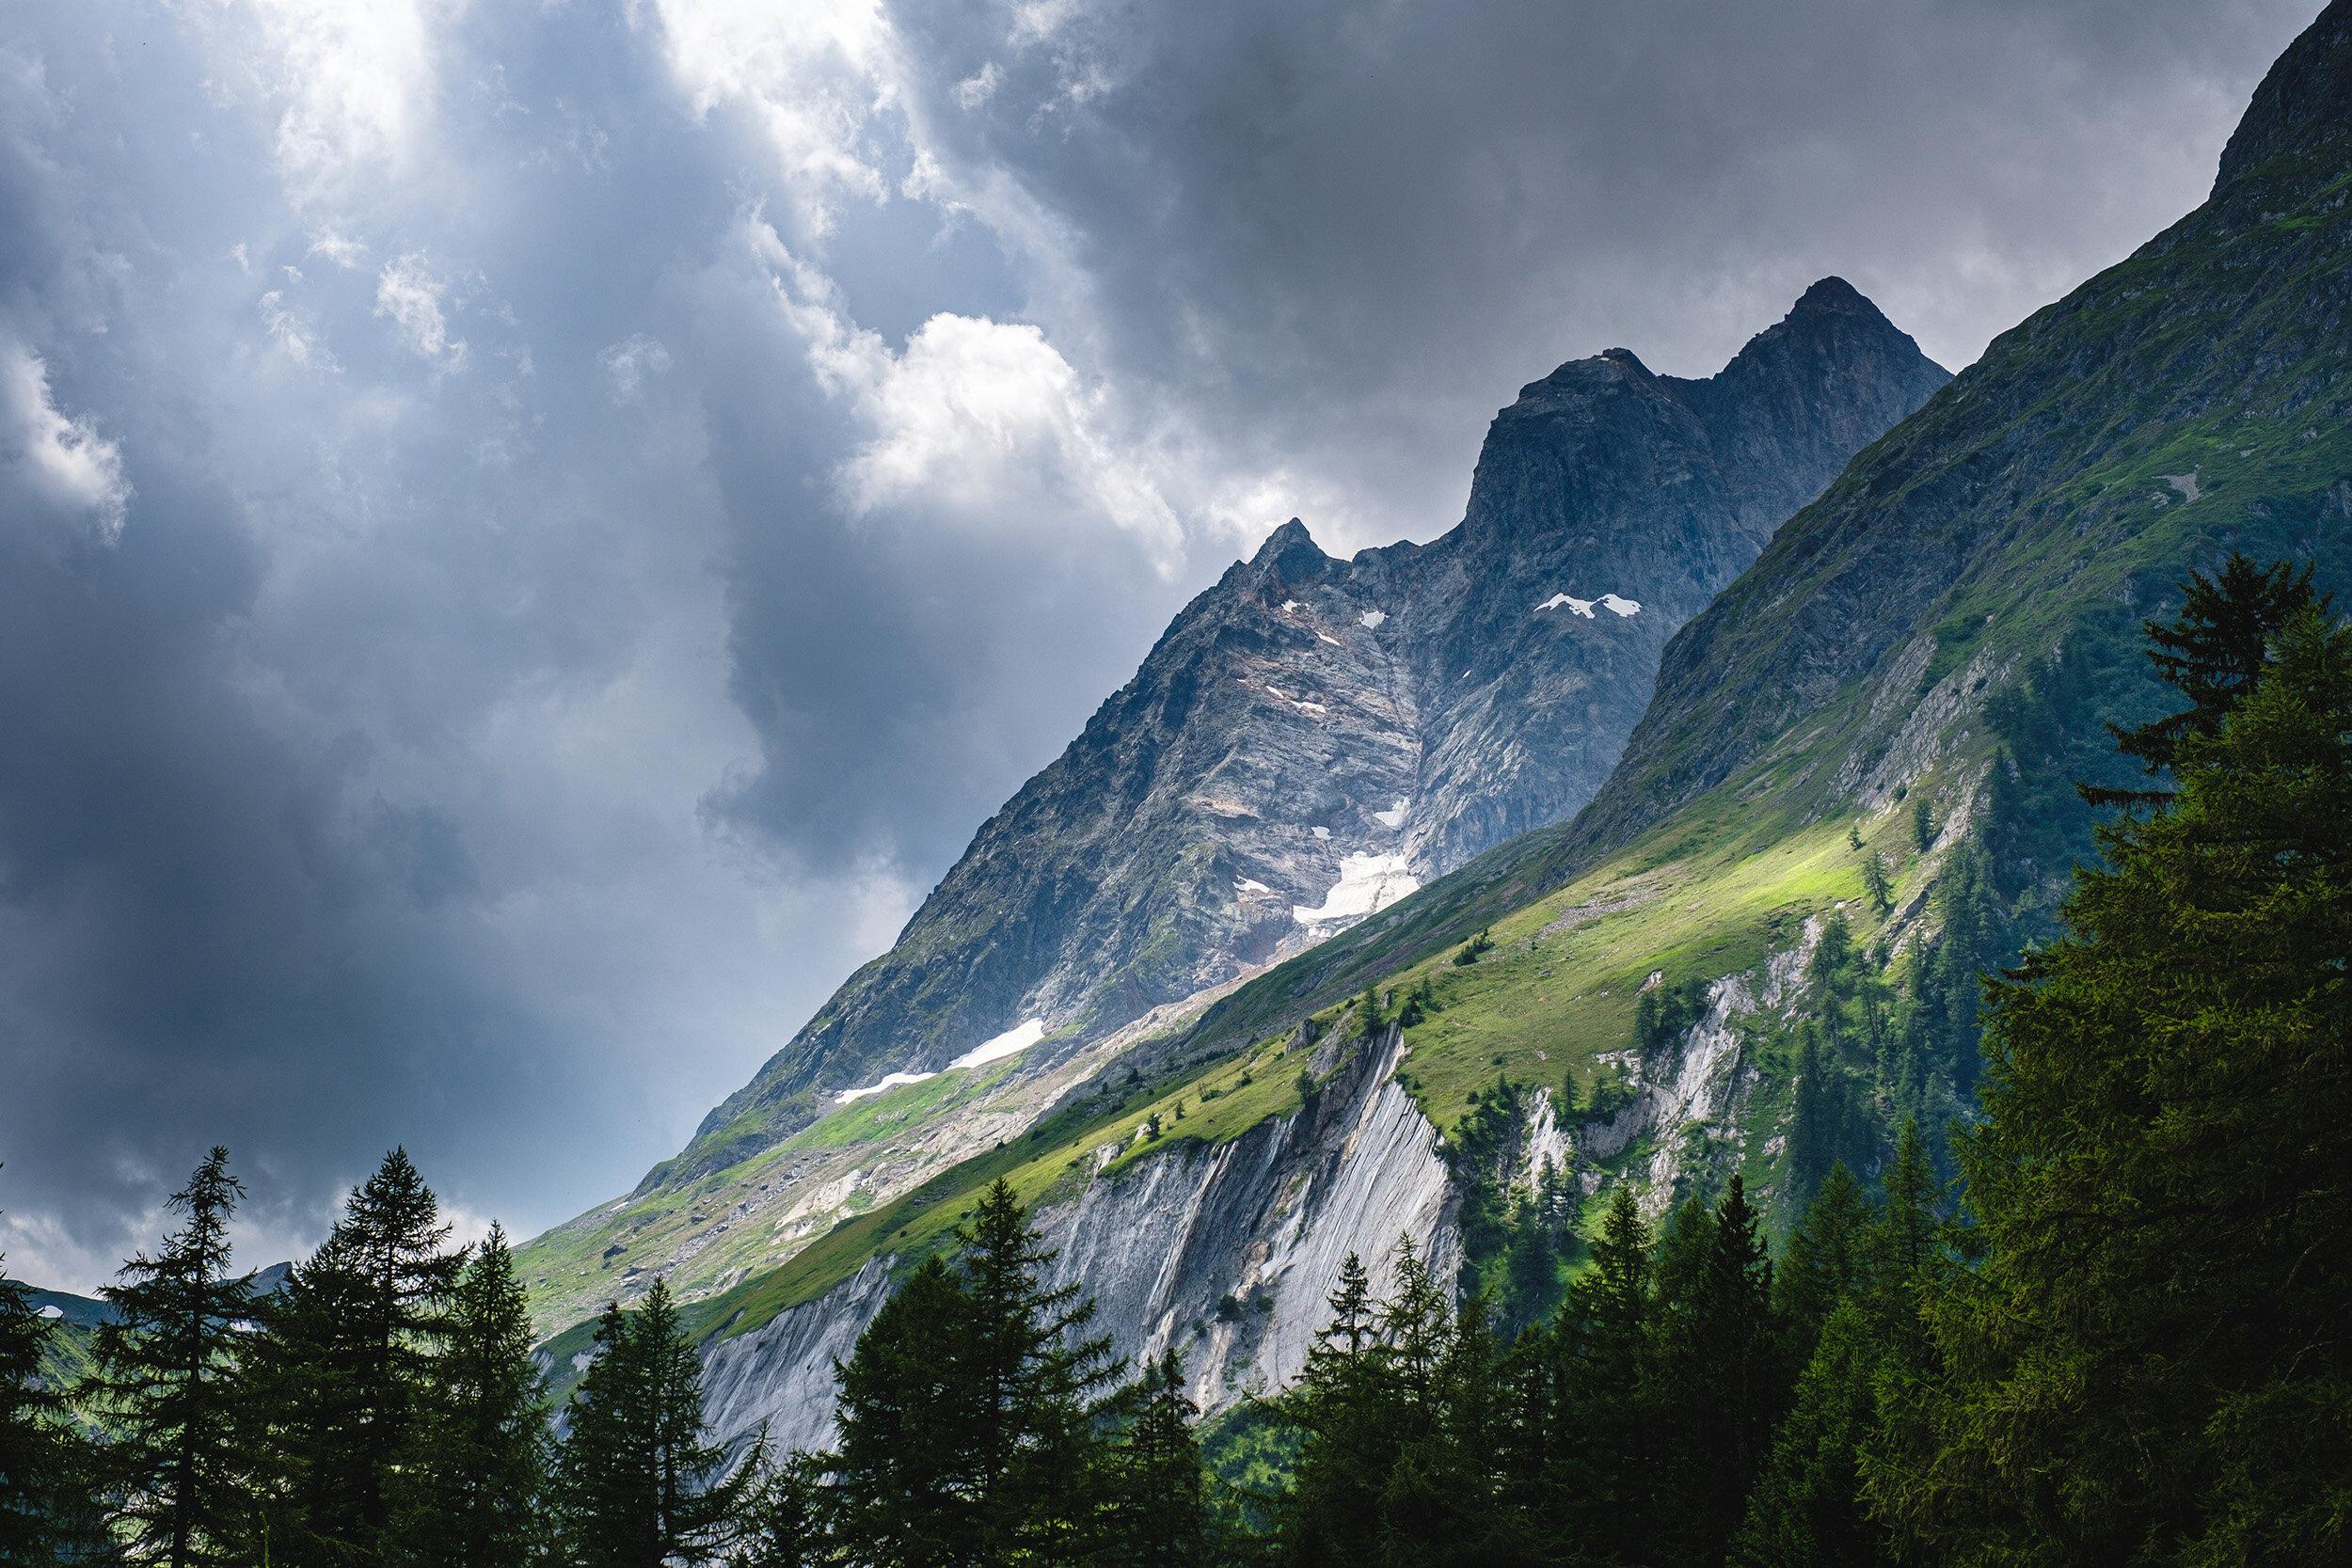 Swiss Alps - Mont Blanc Massif-1.jpg